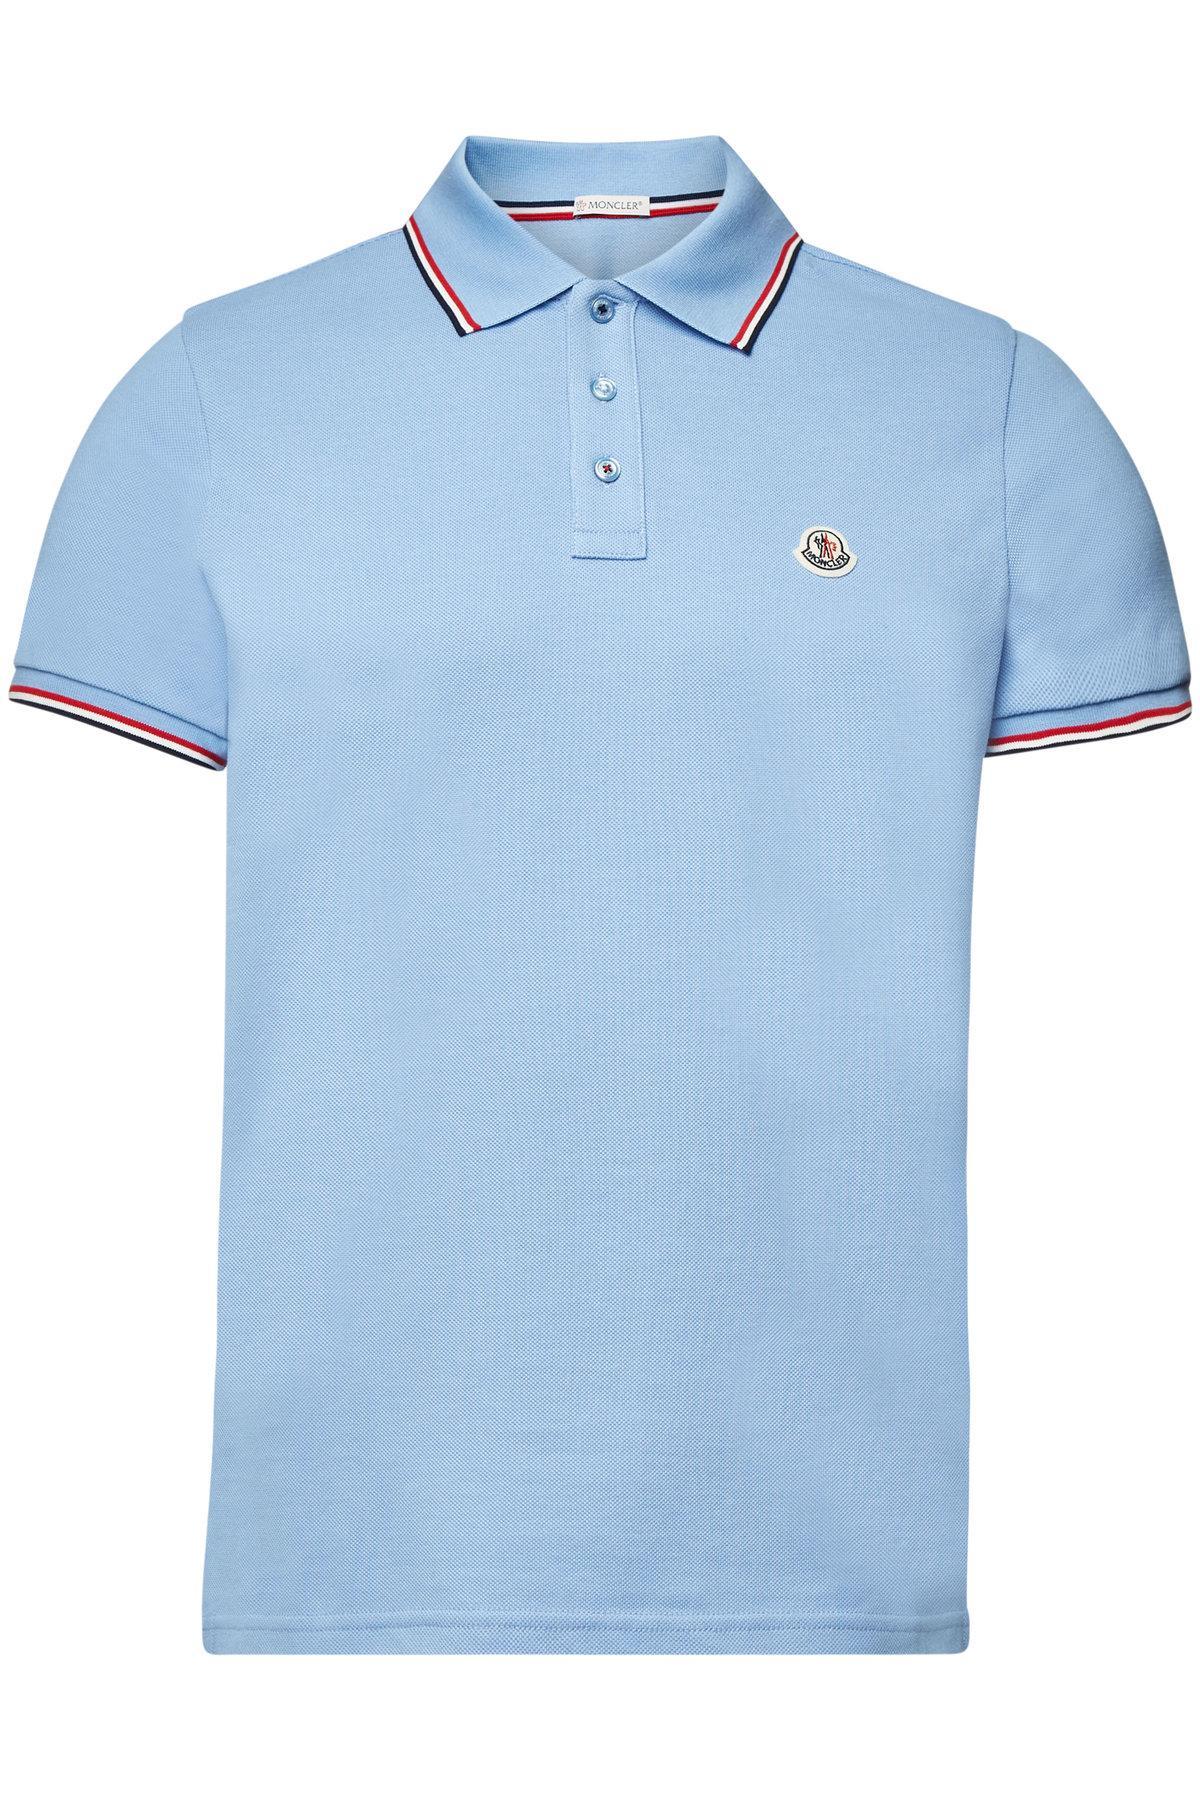 c7e2a62496d12 Moncler - Blue Cotton Polo T-shirt for Men - Lyst. View fullscreen